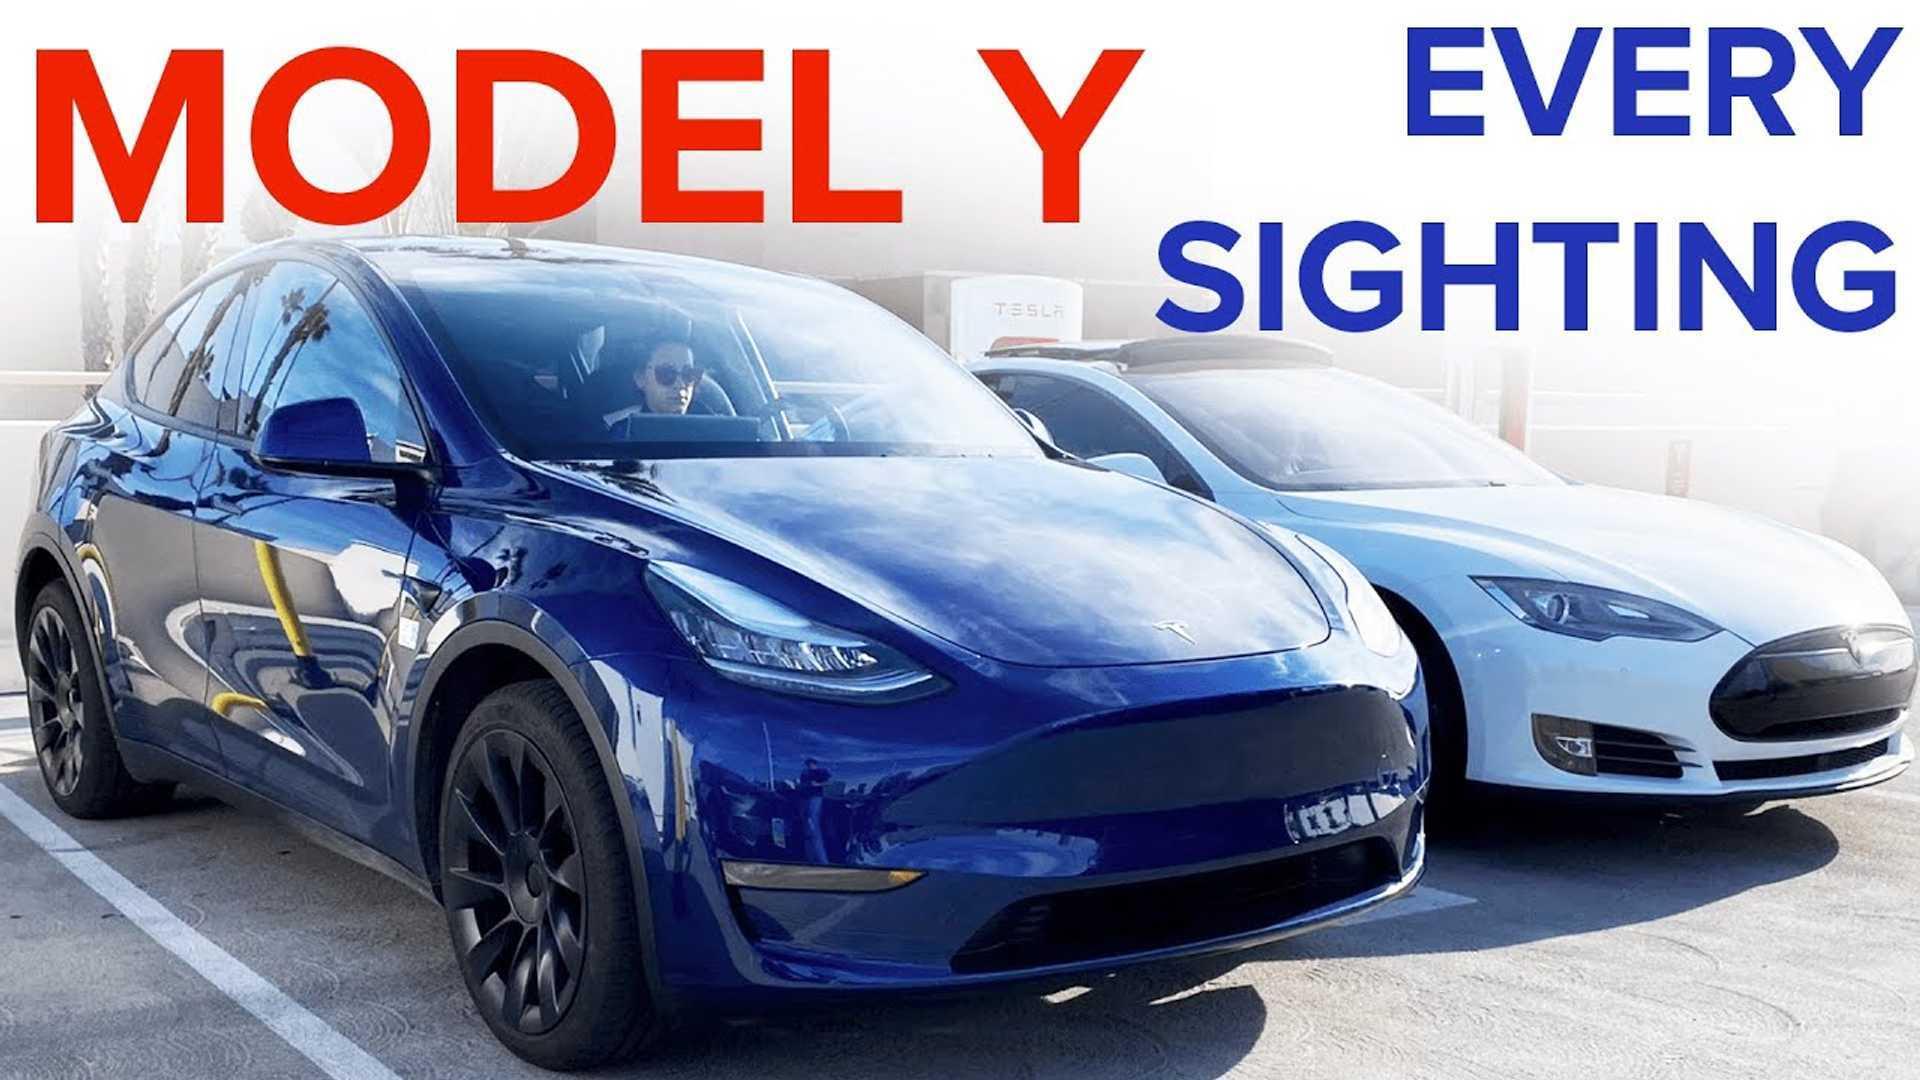 Tesla Model Y Image Extravaganza: Video Compilation Of Every Sighting